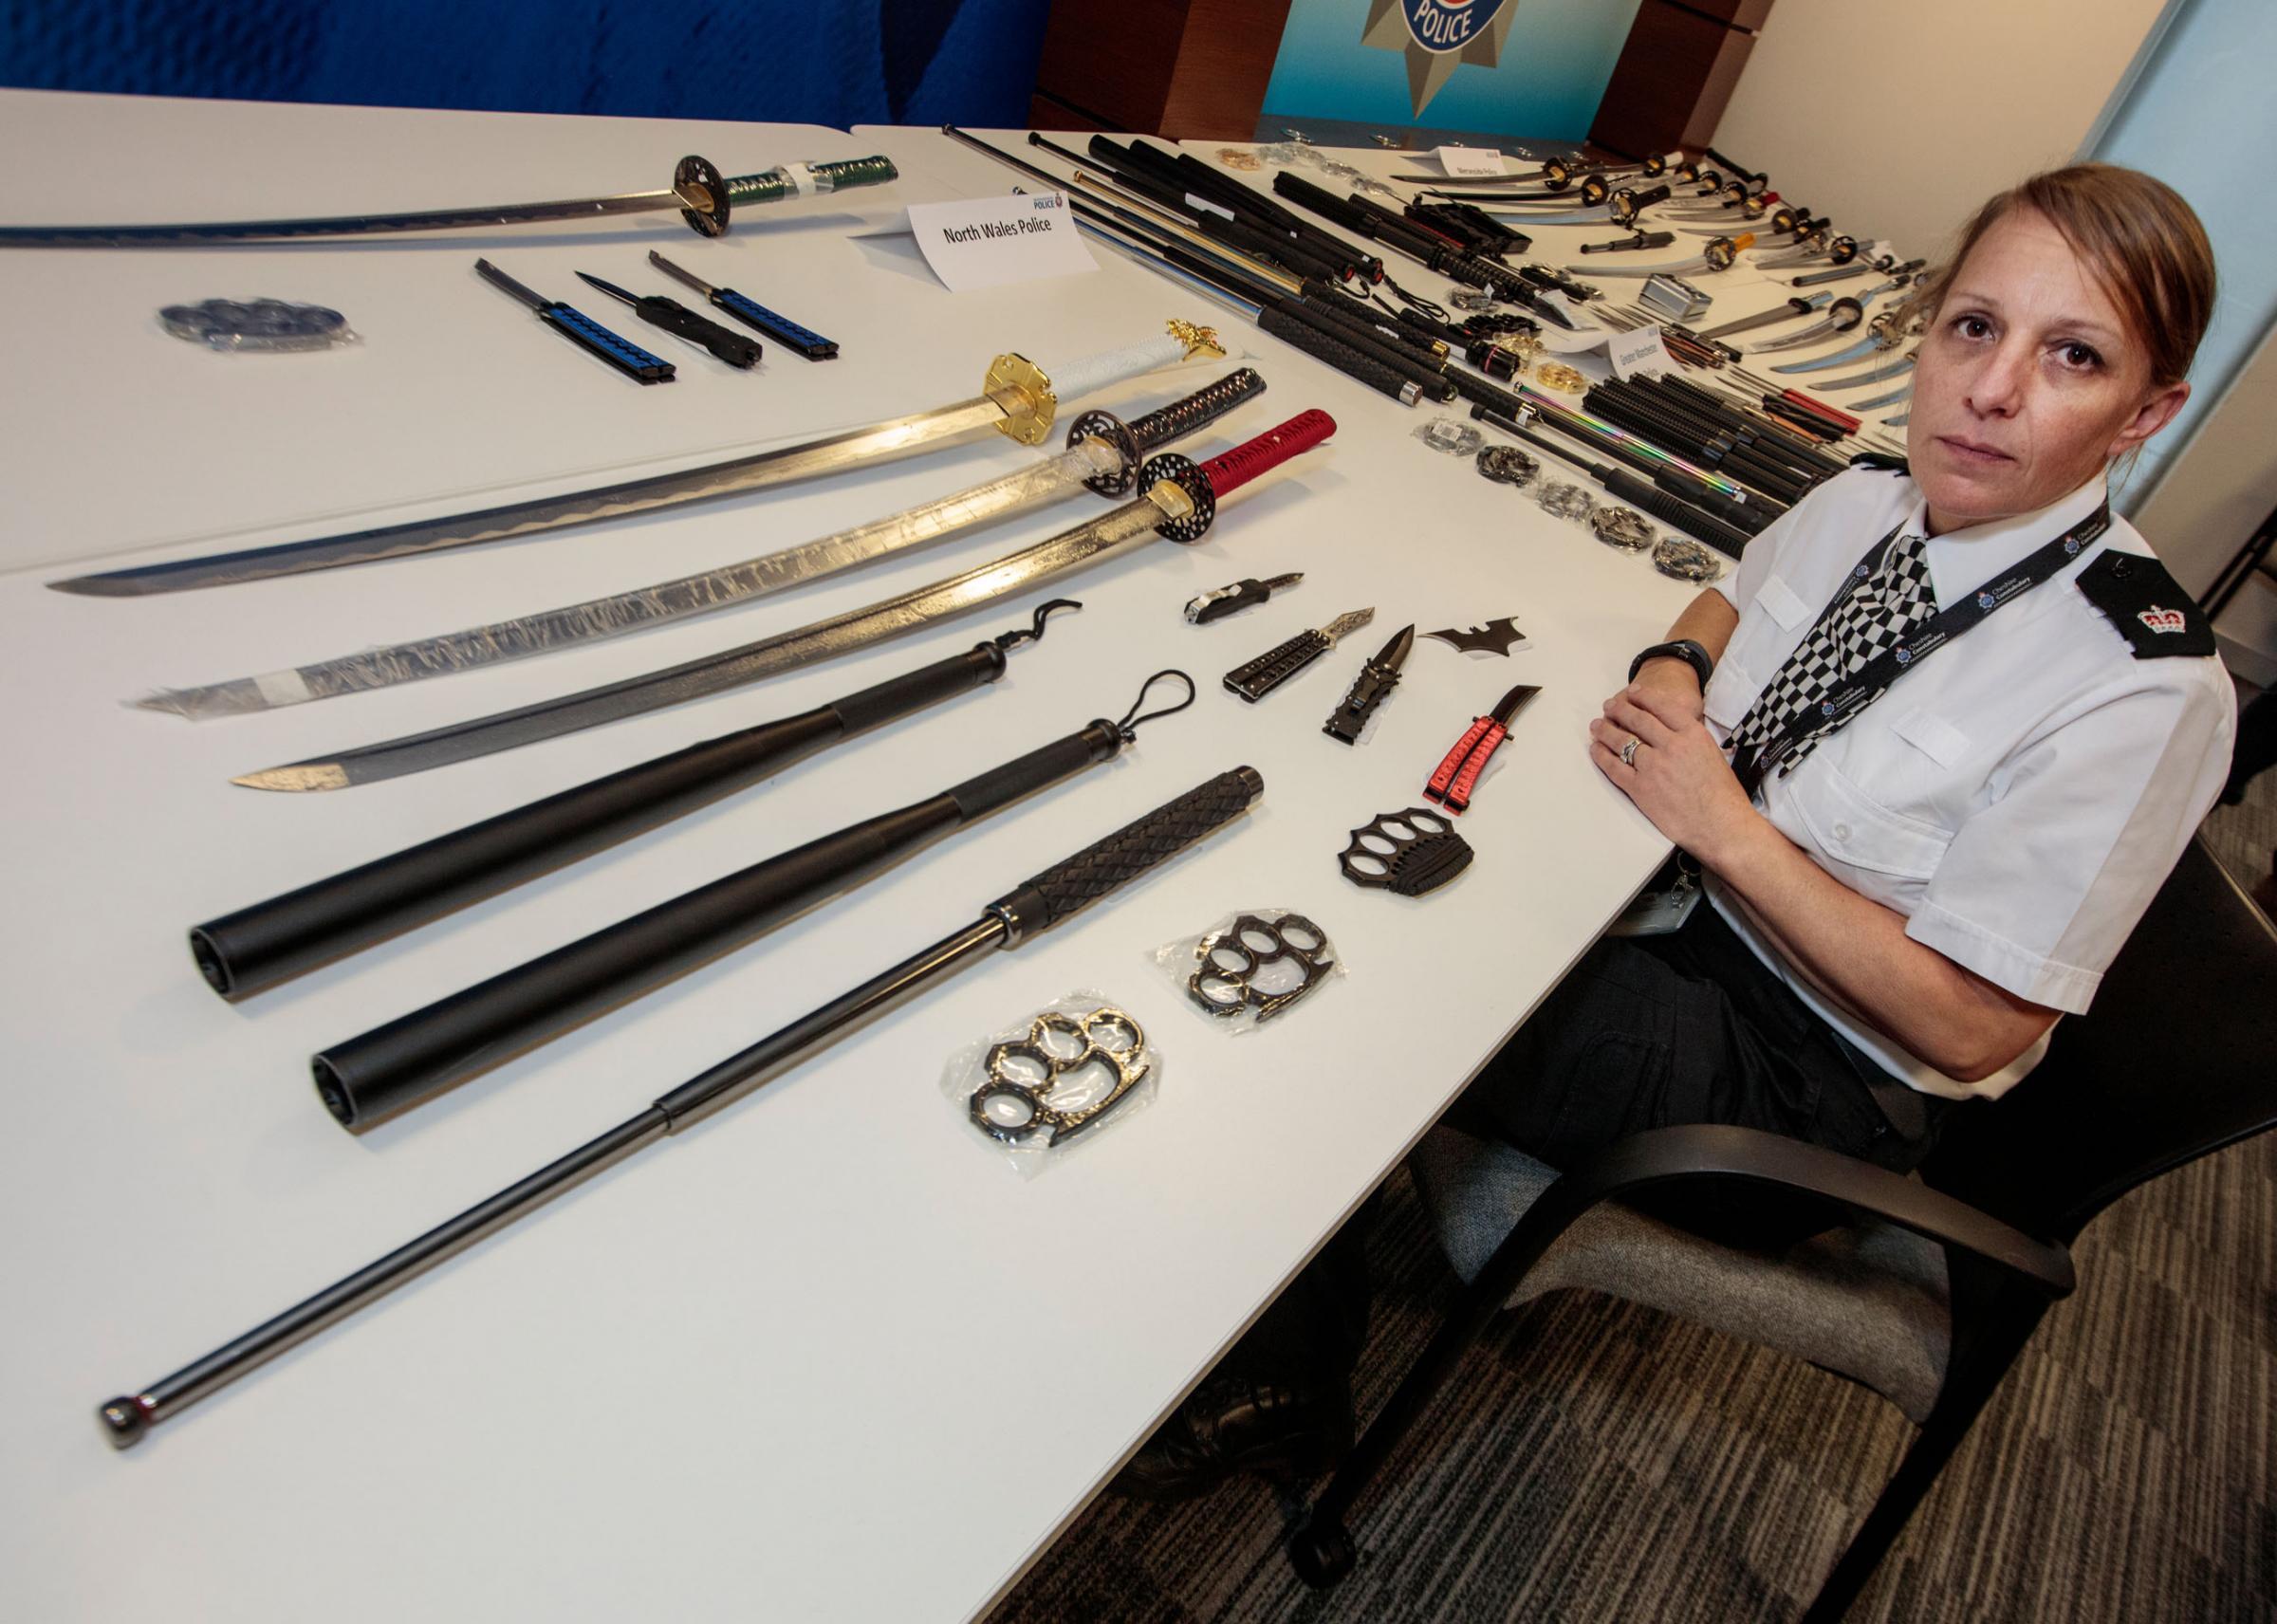 Police intercept swords and Batman throwing knife in post